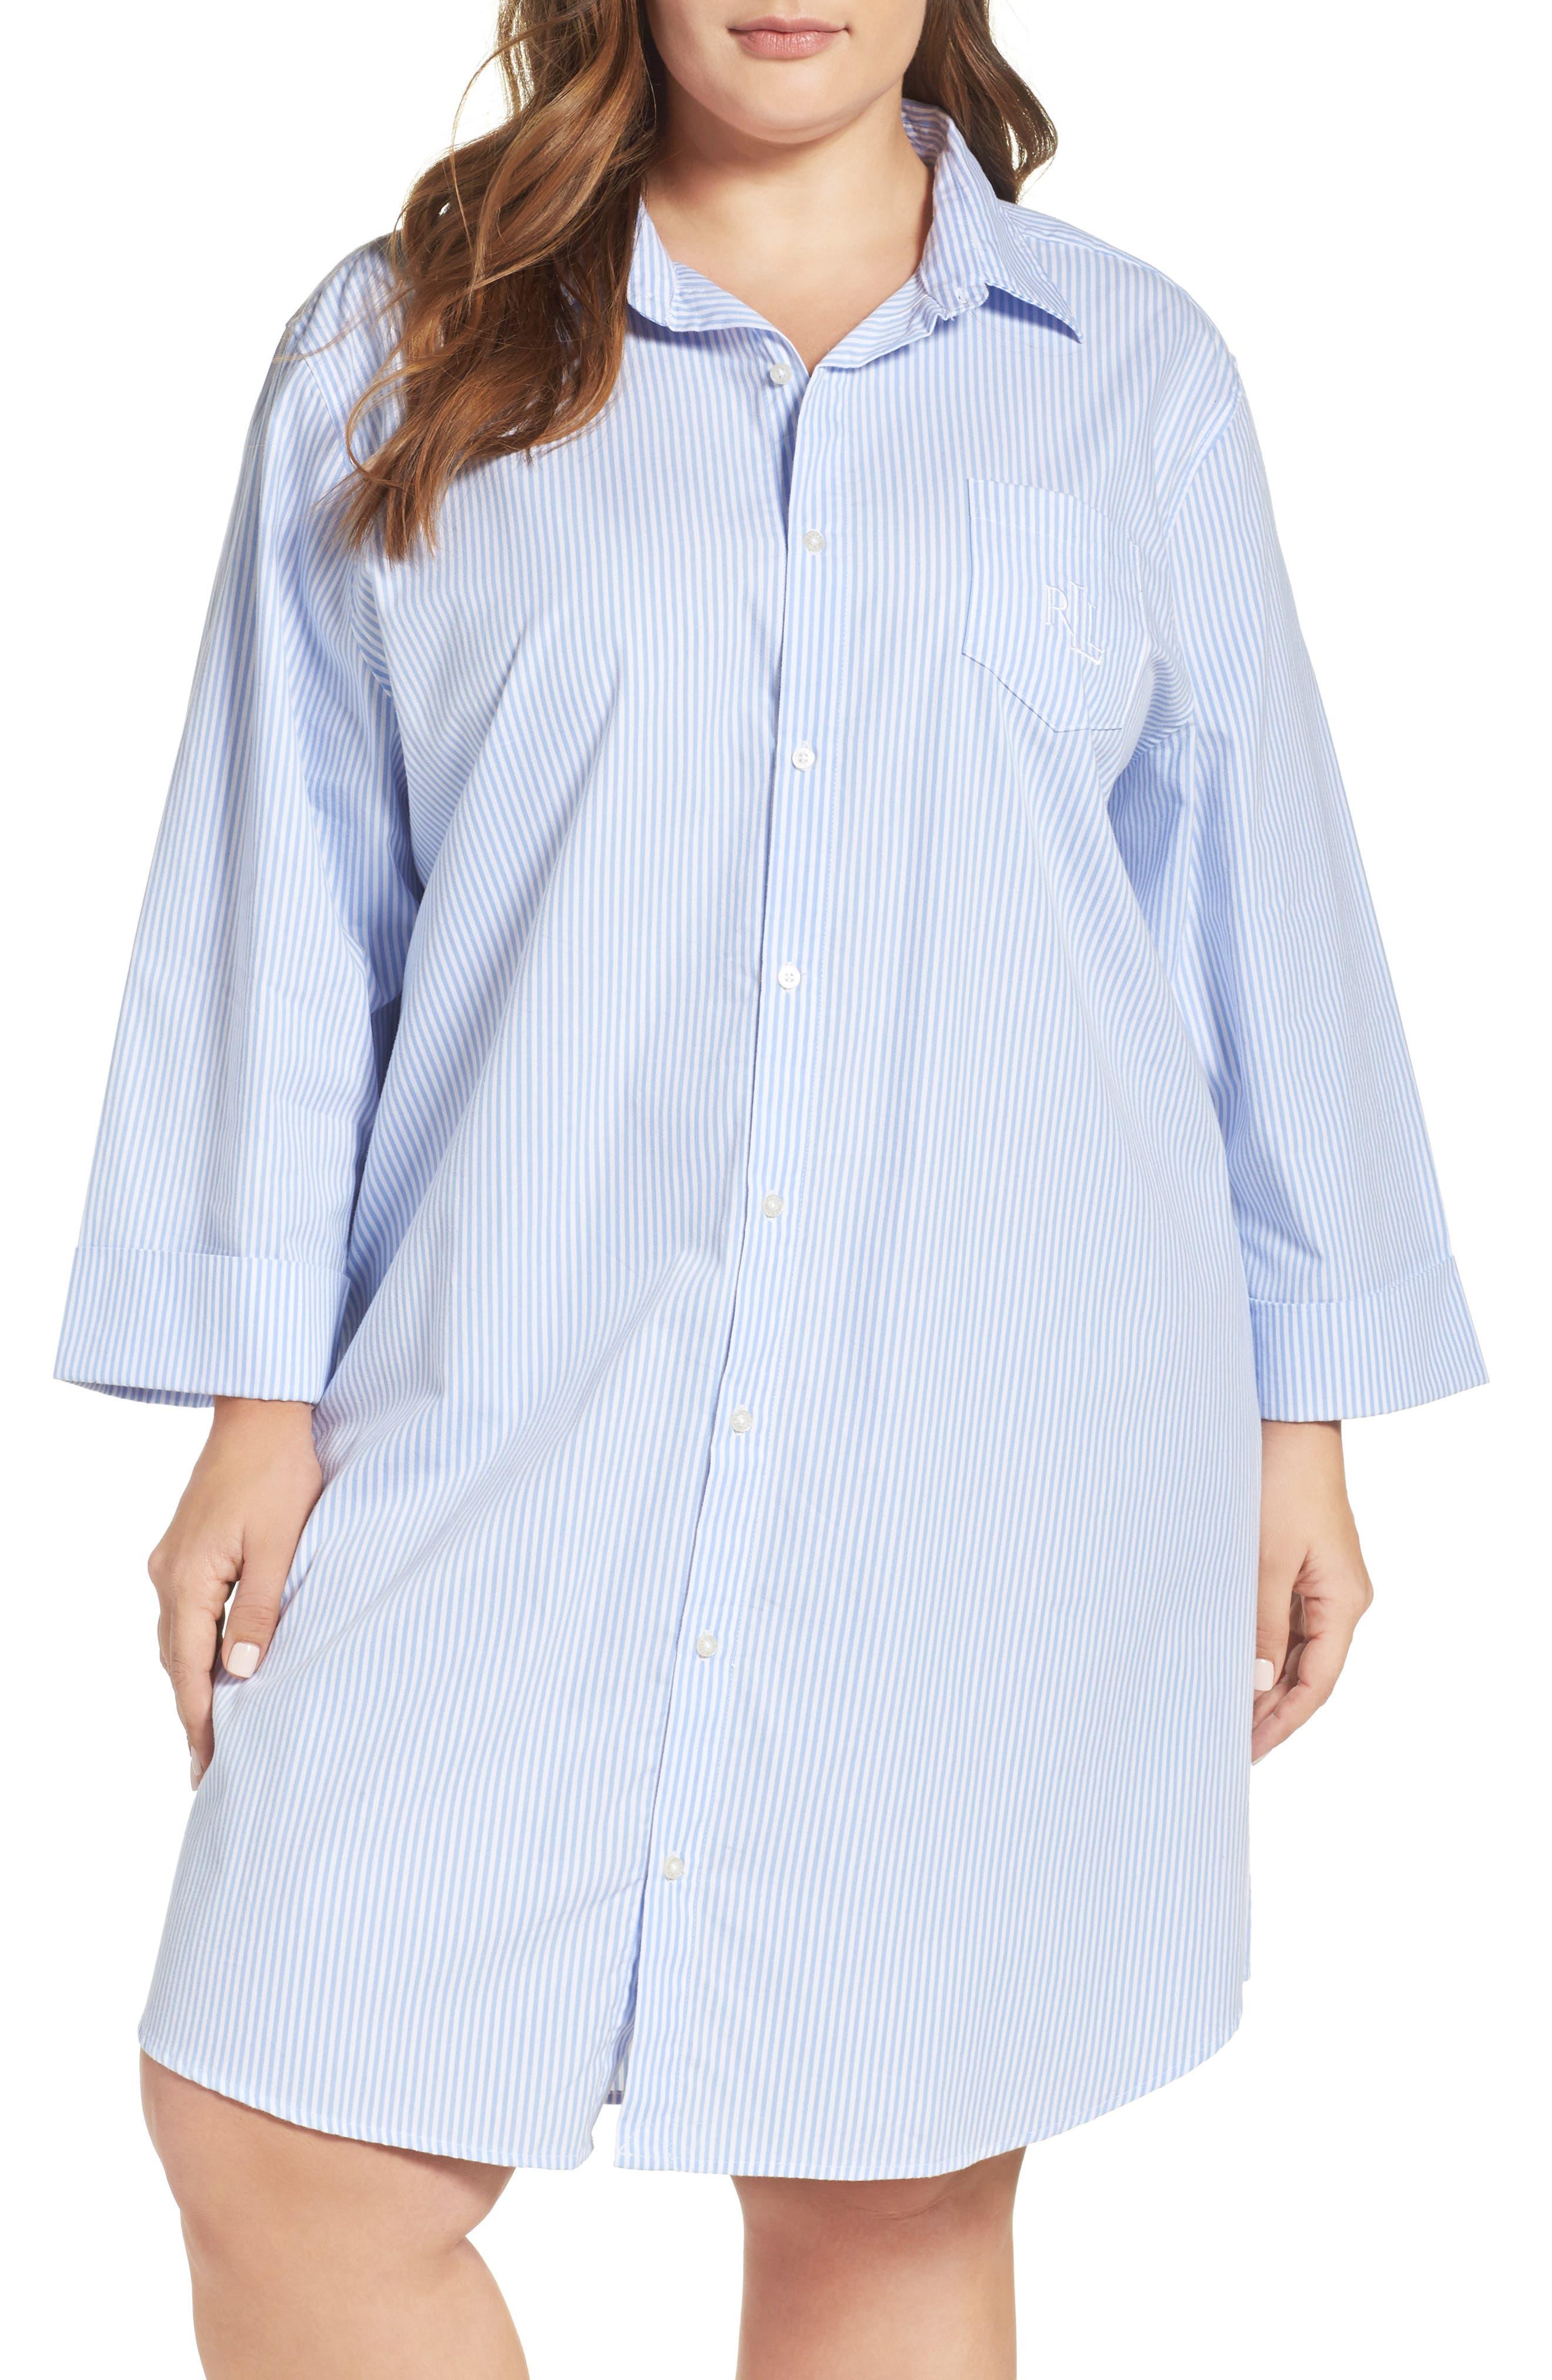 Sleep Shirt,                         Main,                         color, Stripe French Blue/ White